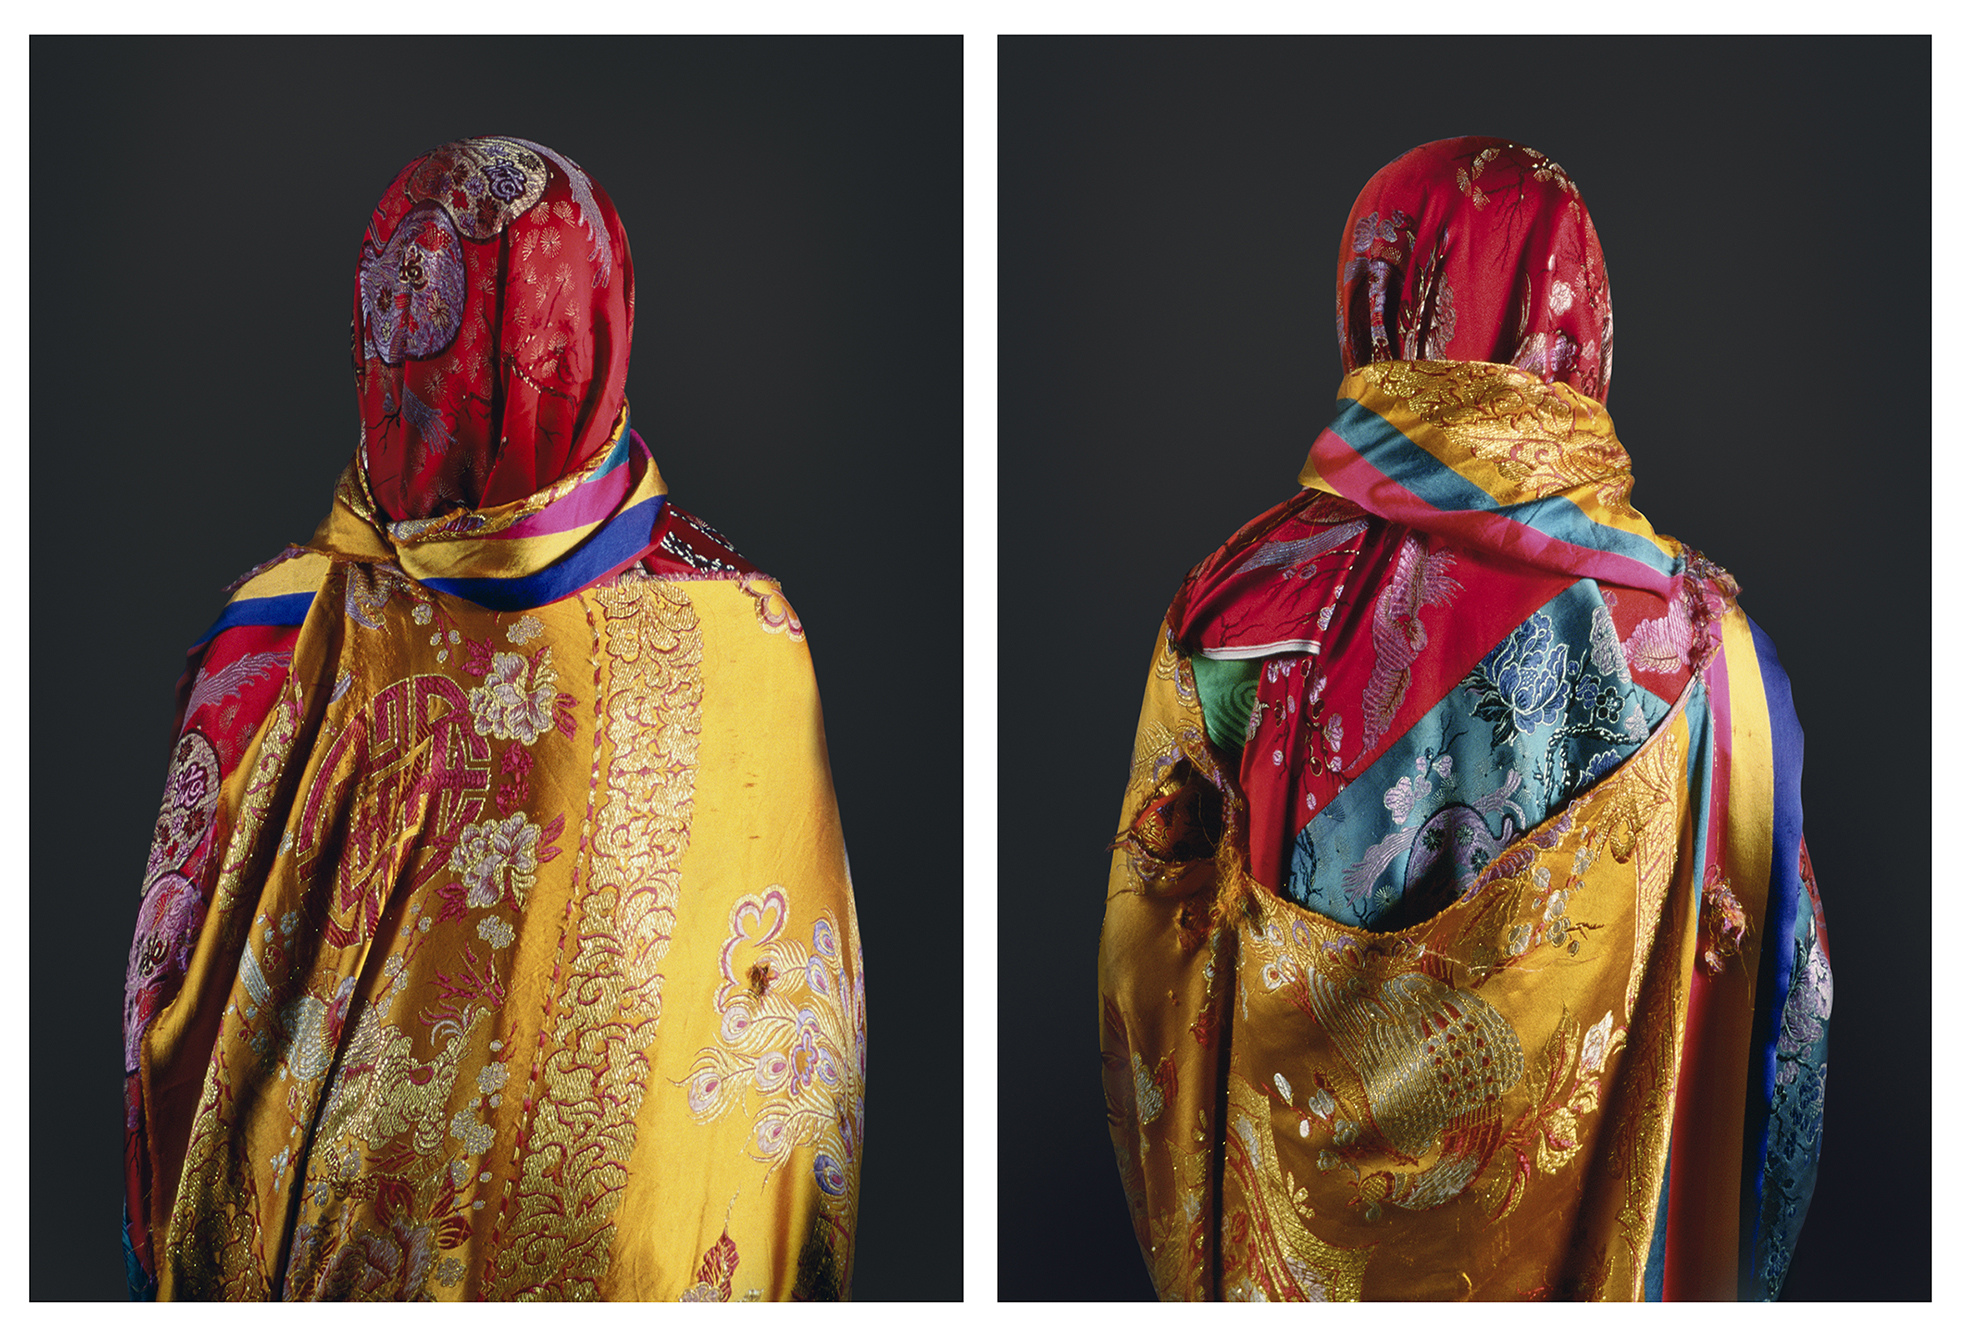 Raffaella Cortese – Sooja Kim. Kimsooja, Deductive Object (VI) & (VII), 1996-2013 -1996 – Courtesy of the artist and Galleria Raffaella Cortese, Milan Photocredit Martin Argyroglo – Digital Flex Print Sandwich Mounted – 102×75 cm